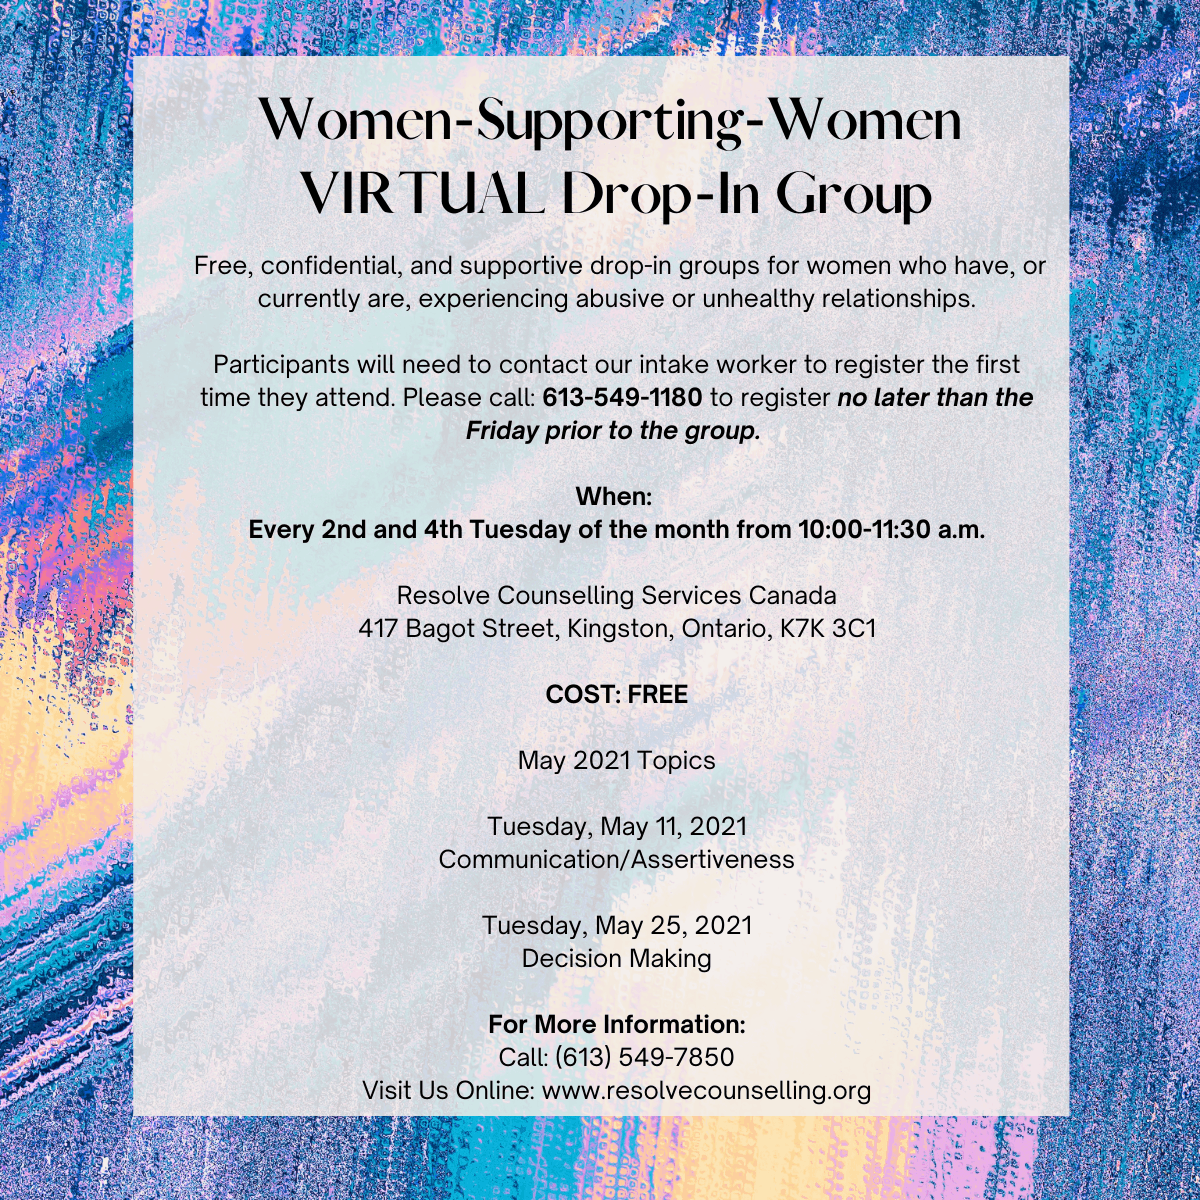 Women-Supporting-Women VIRTUAL Drop-In Group - May